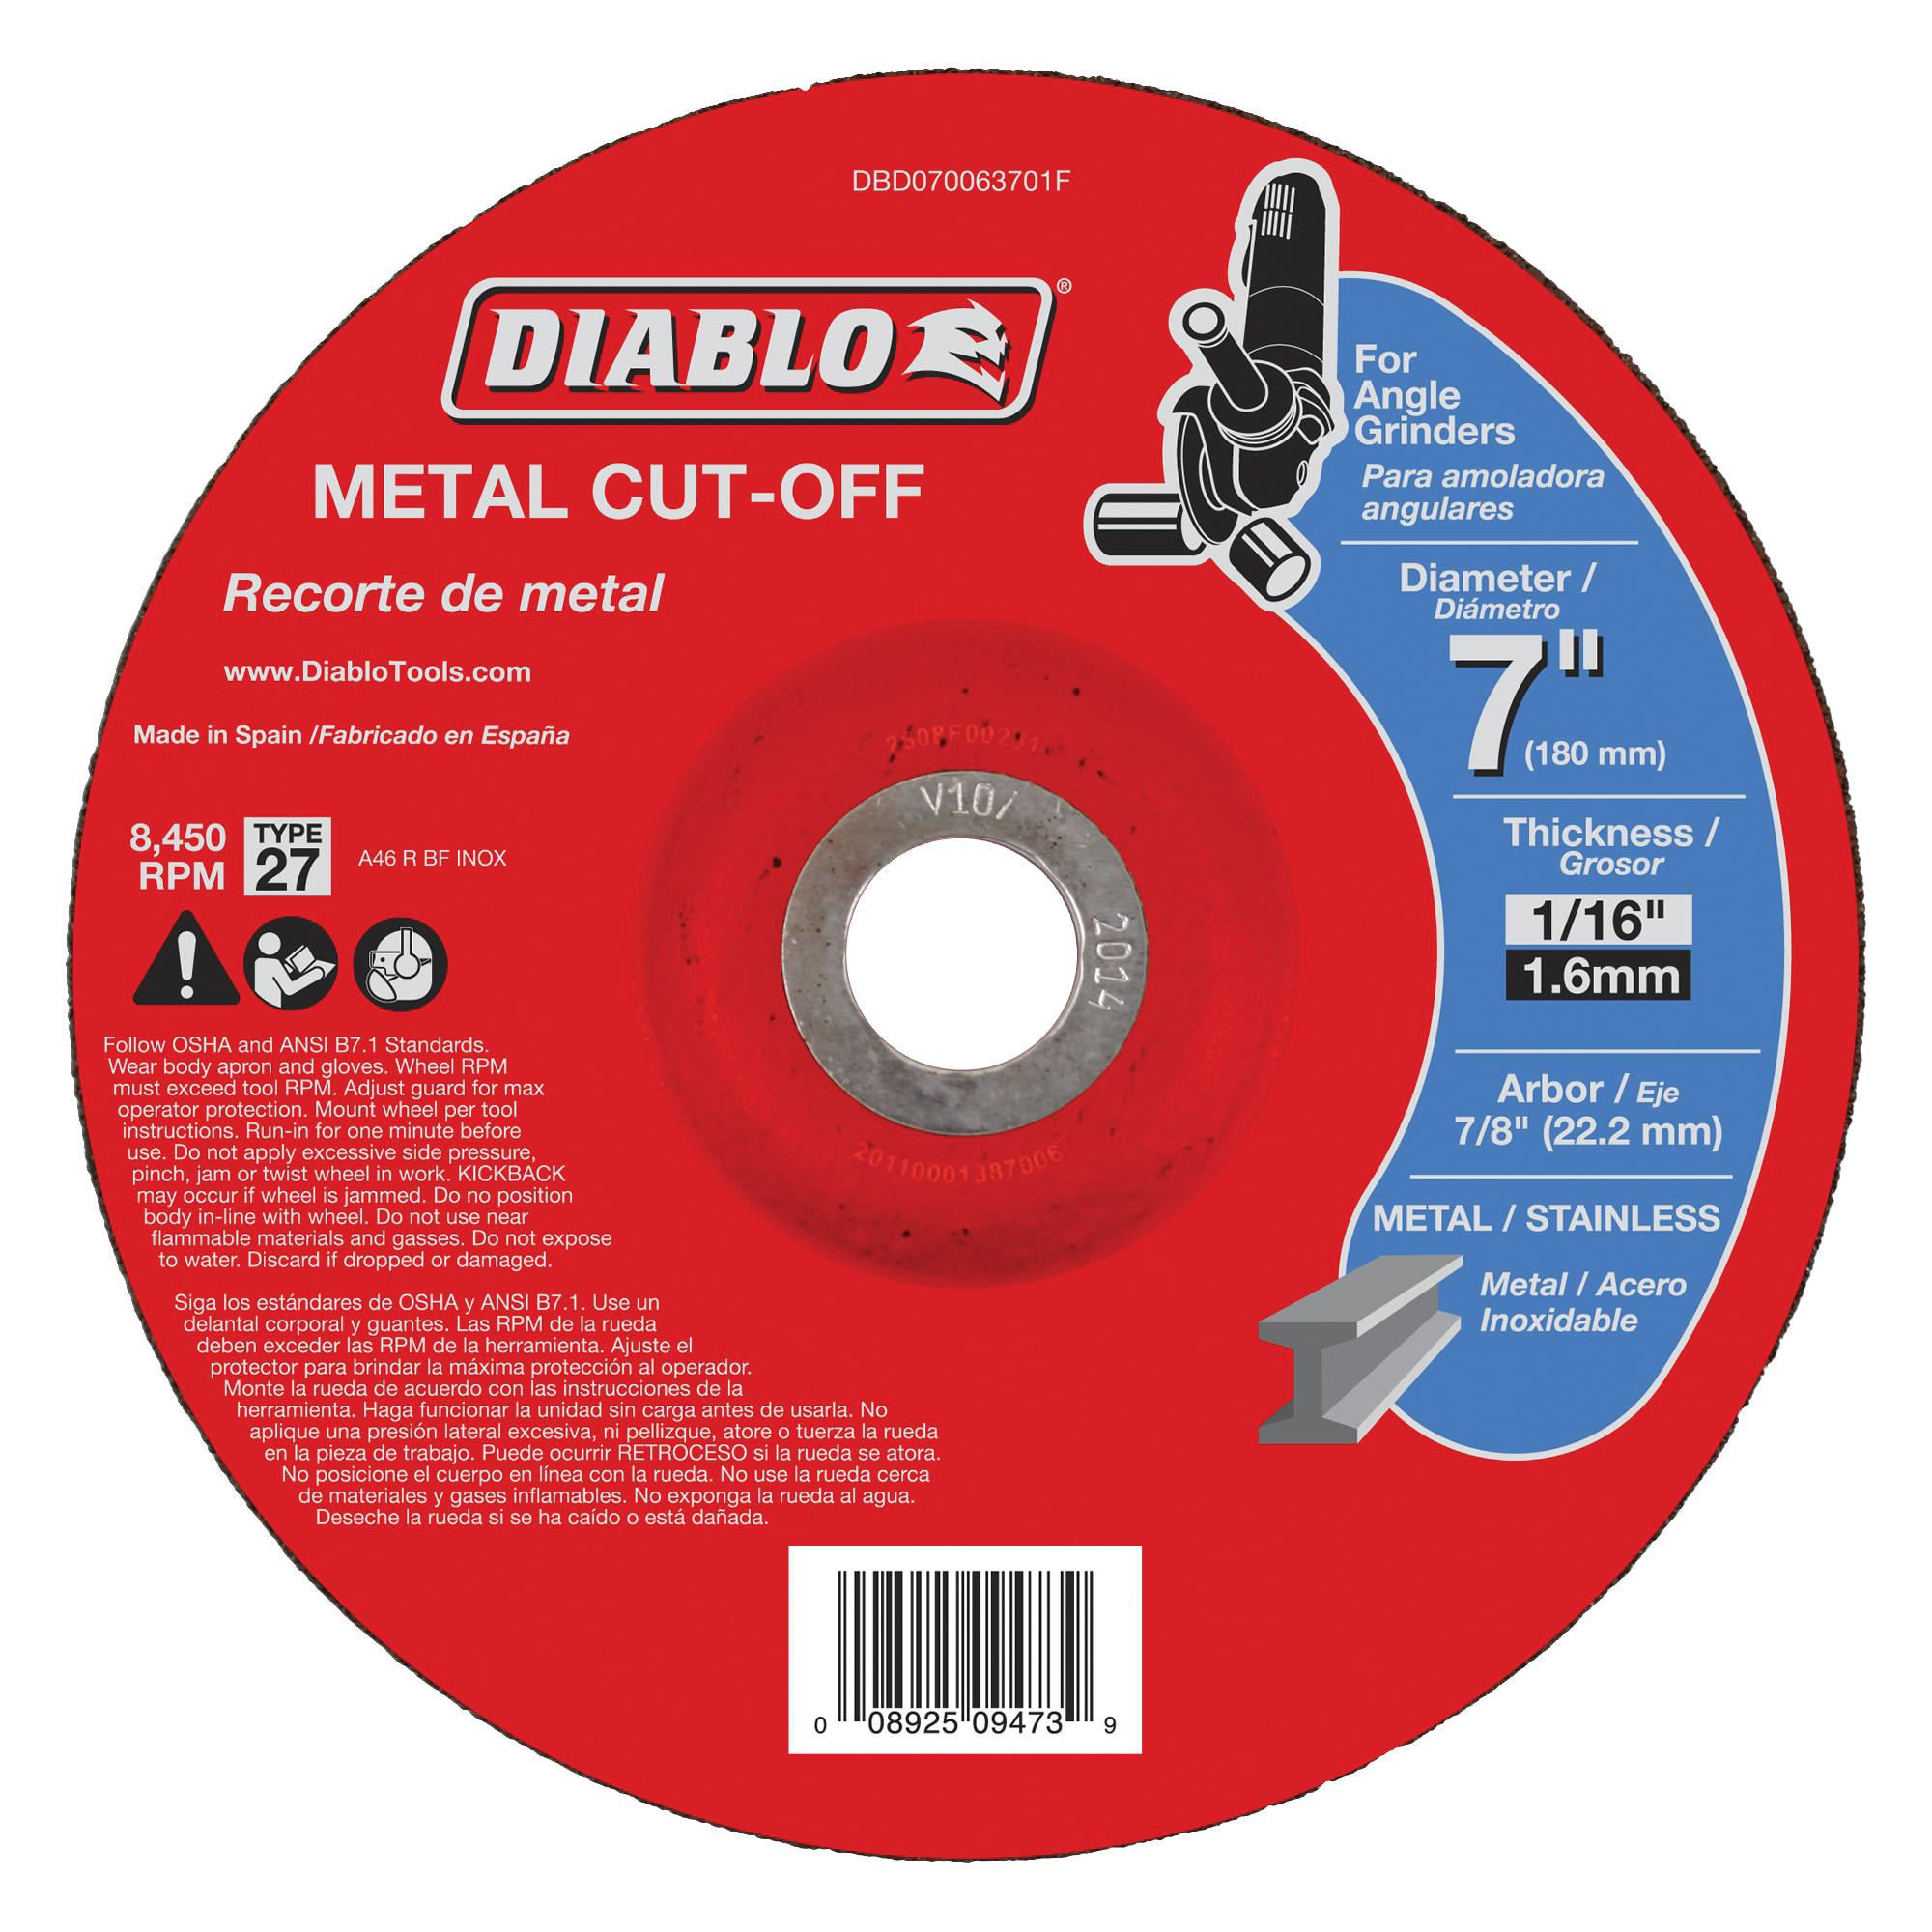 Picture of Diablo DBD070063701F Cut-Off Wheel, 7 in Dia, 1/16 in Thick, 7/8 in Arbor, Aluminum Oxide Abrasive